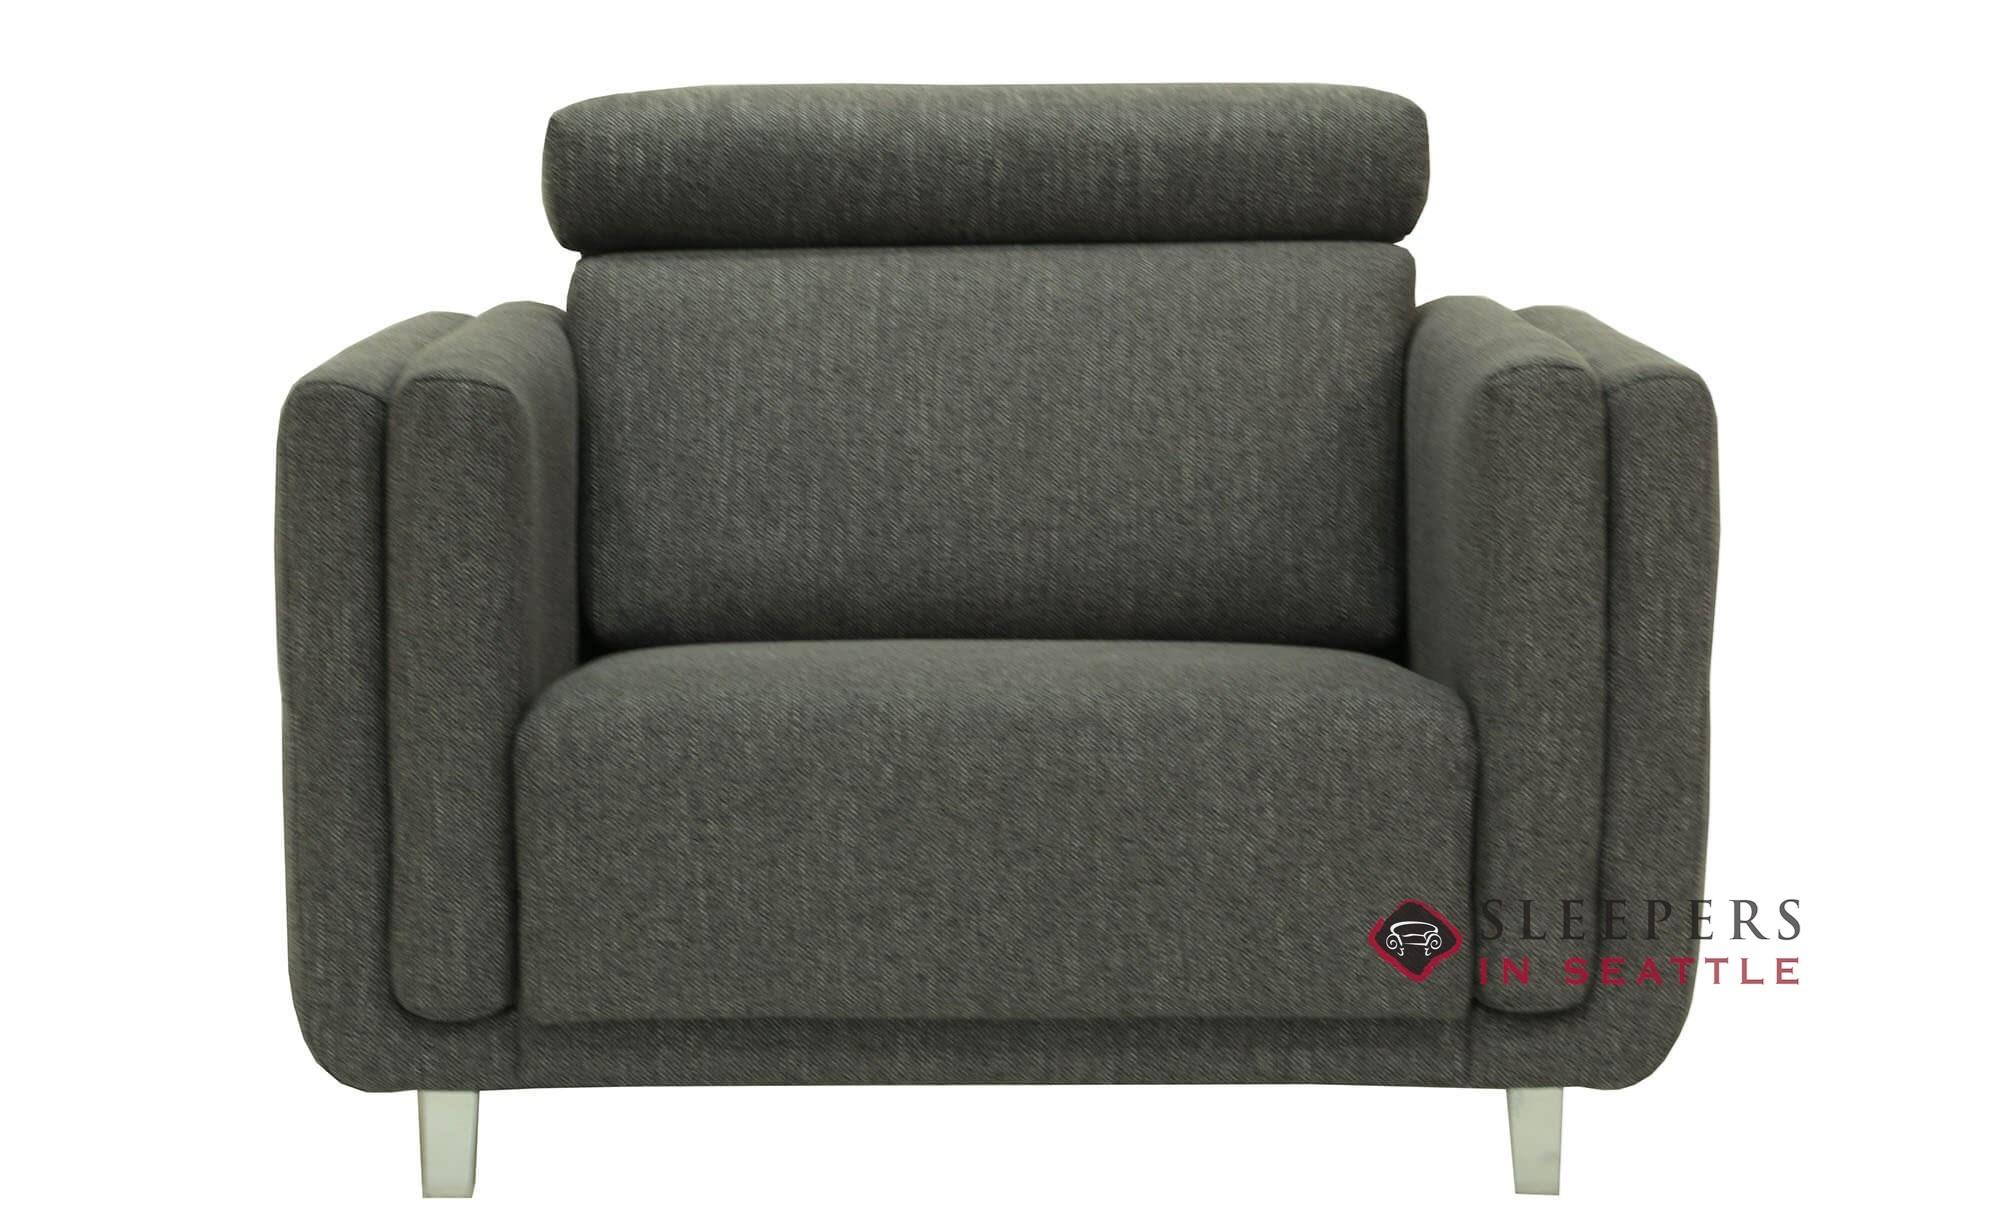 Outstanding Luonto Paris Chair Sleeper Sofa Beatyapartments Chair Design Images Beatyapartmentscom